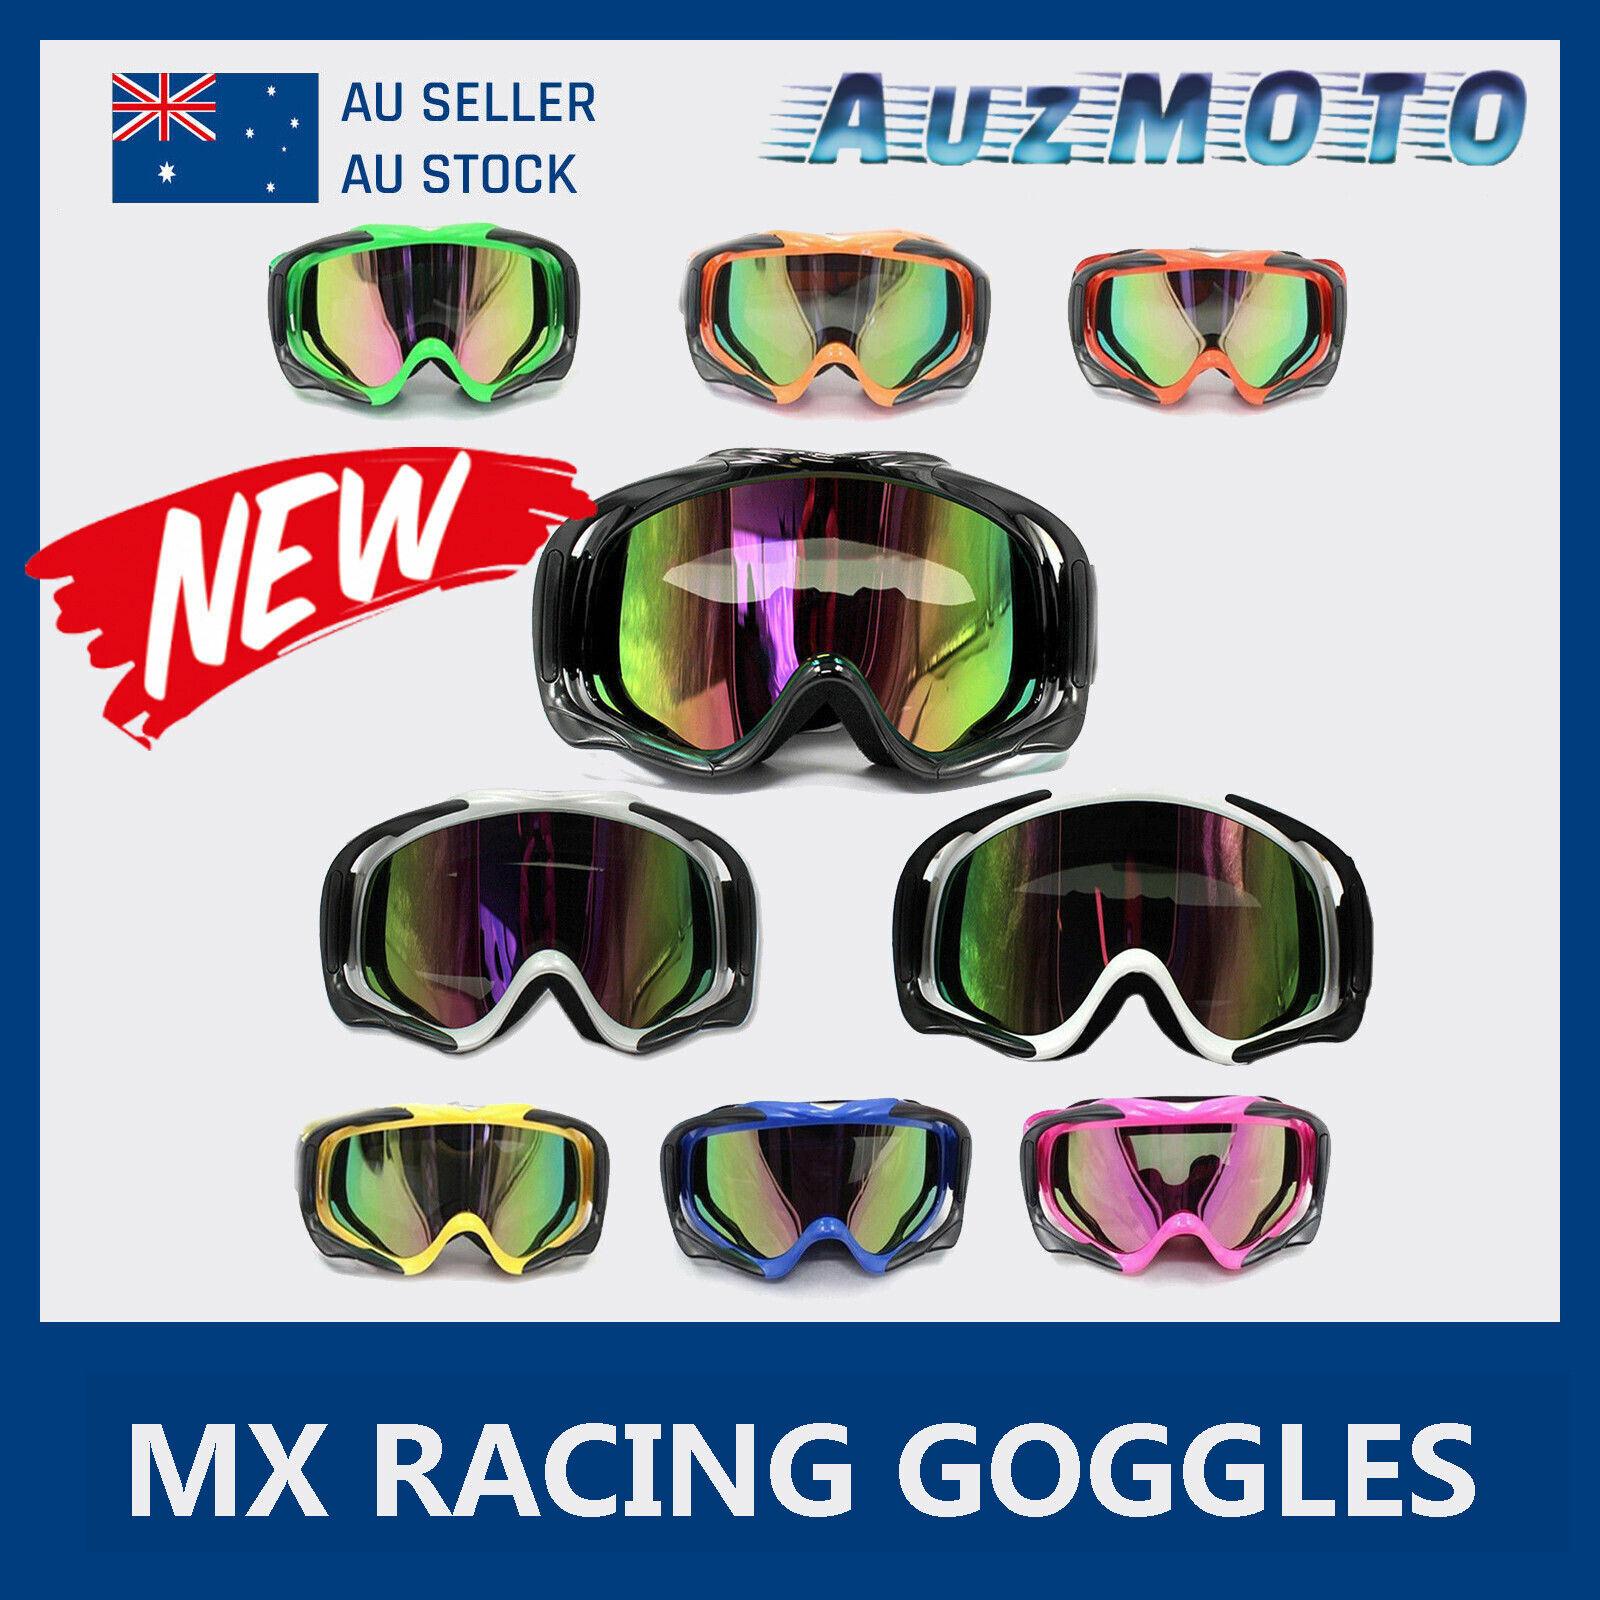 Dirt Bike MX Motocross Goggles anti-fog UV protection tinted graffiti Tinted Len